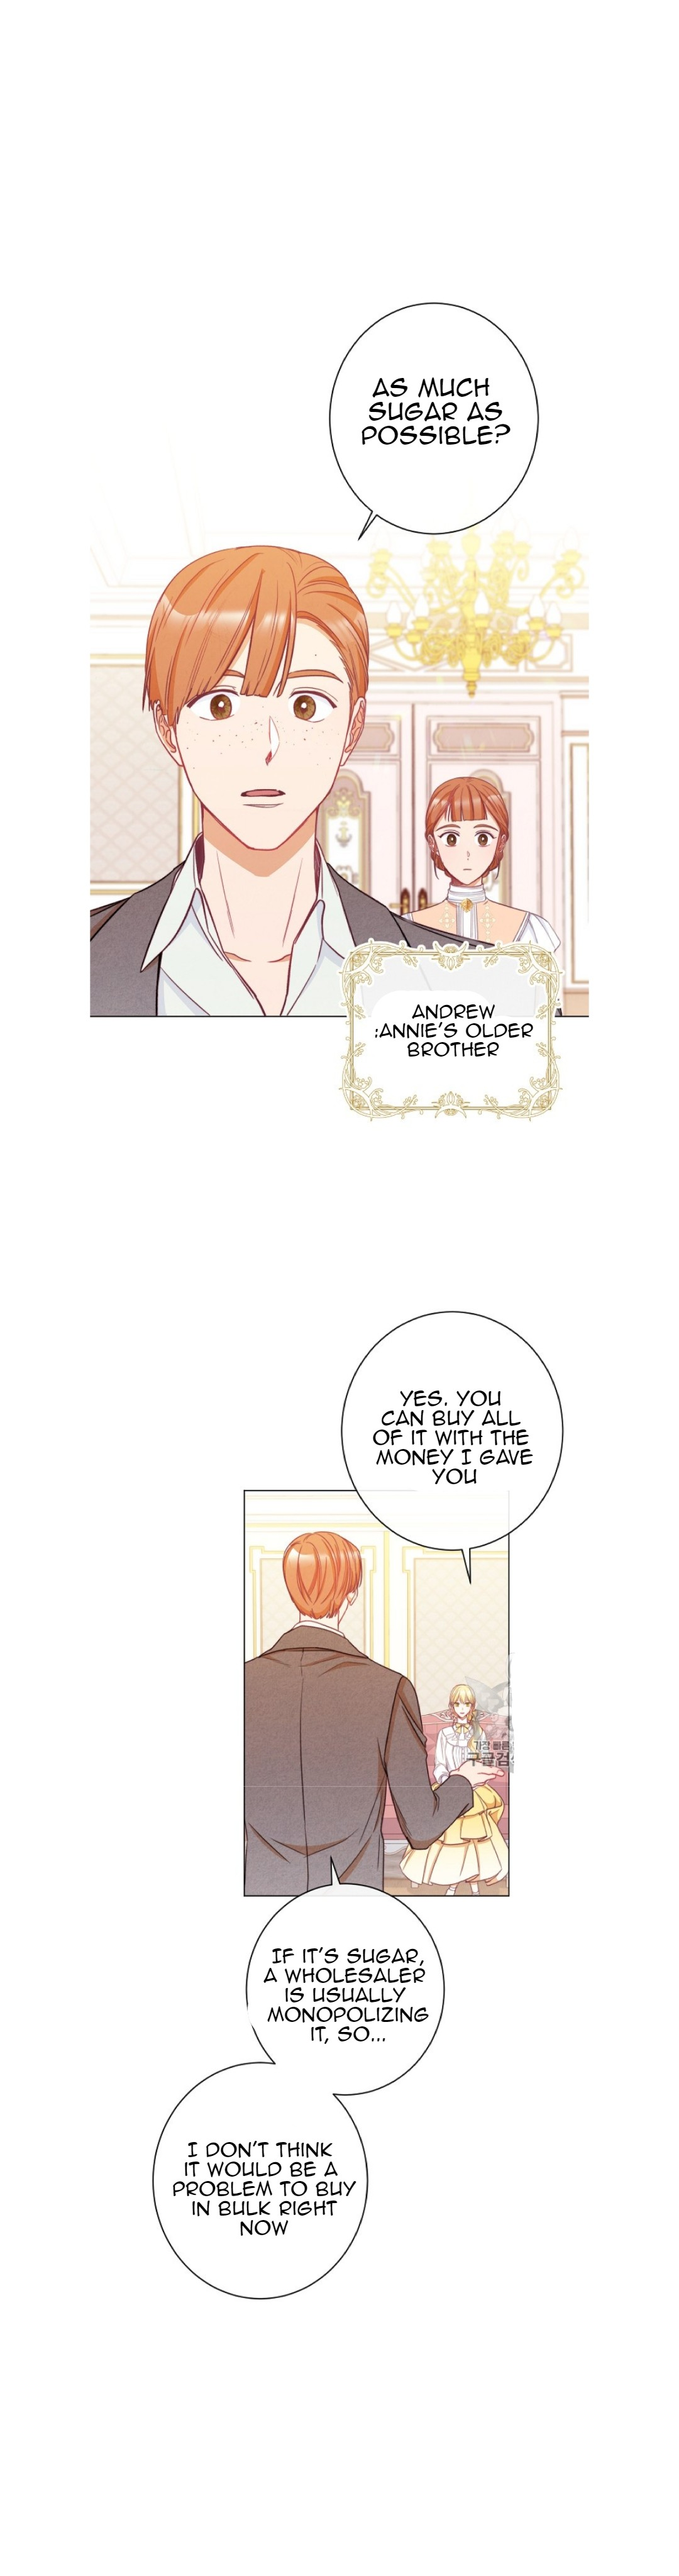 https://manga.mangadogs.com/comics/pic4/51/35315/1883072/41bcfd9ab658ebaac1661f58080aad6b.jpg Page 1